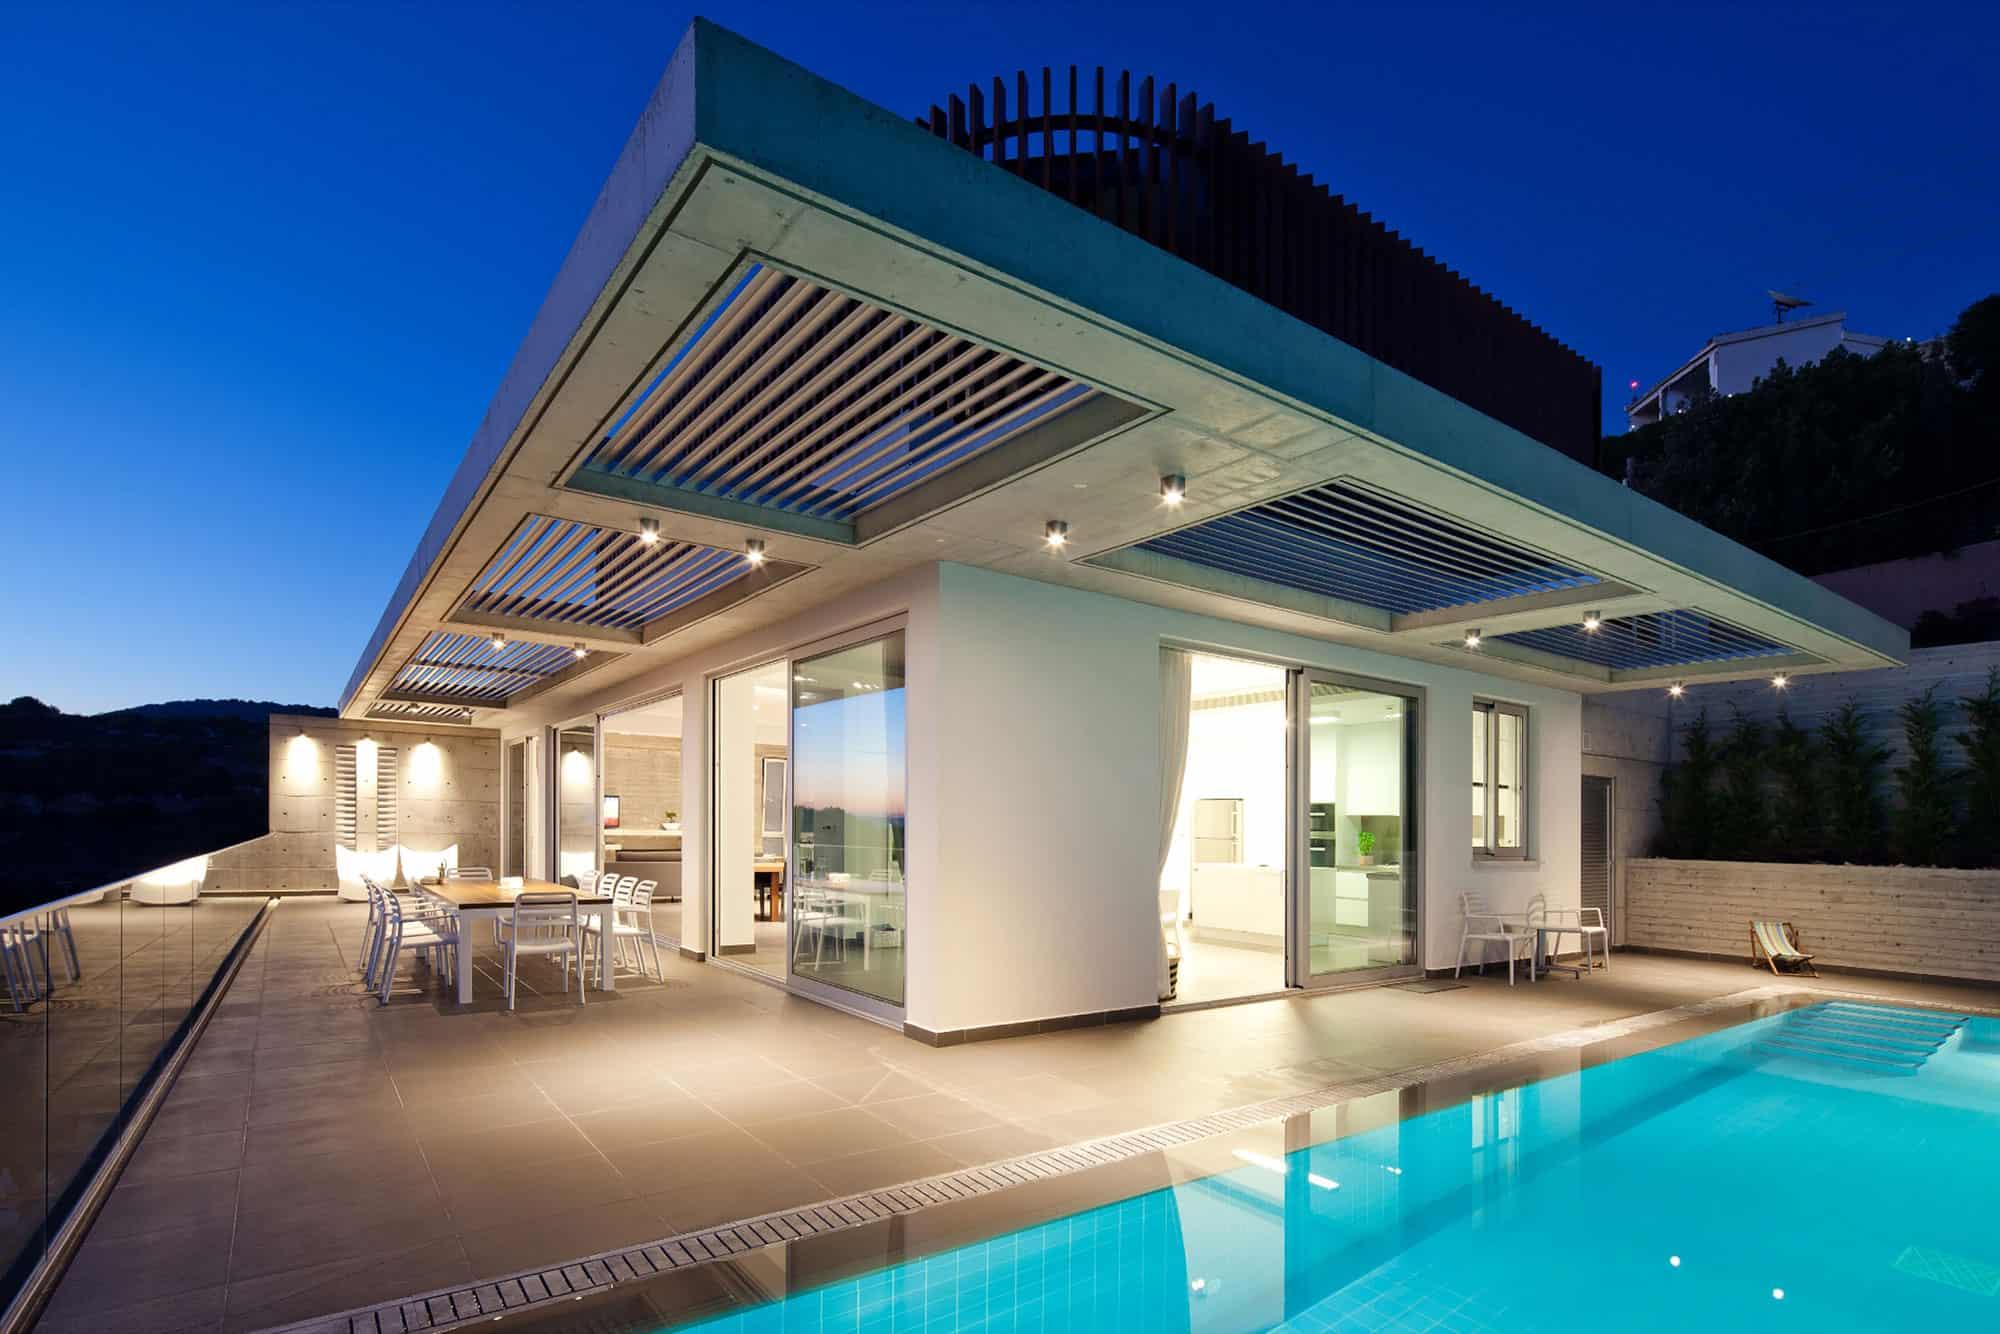 Podromos and Desi Residence by Vardastudio Architects & Designers